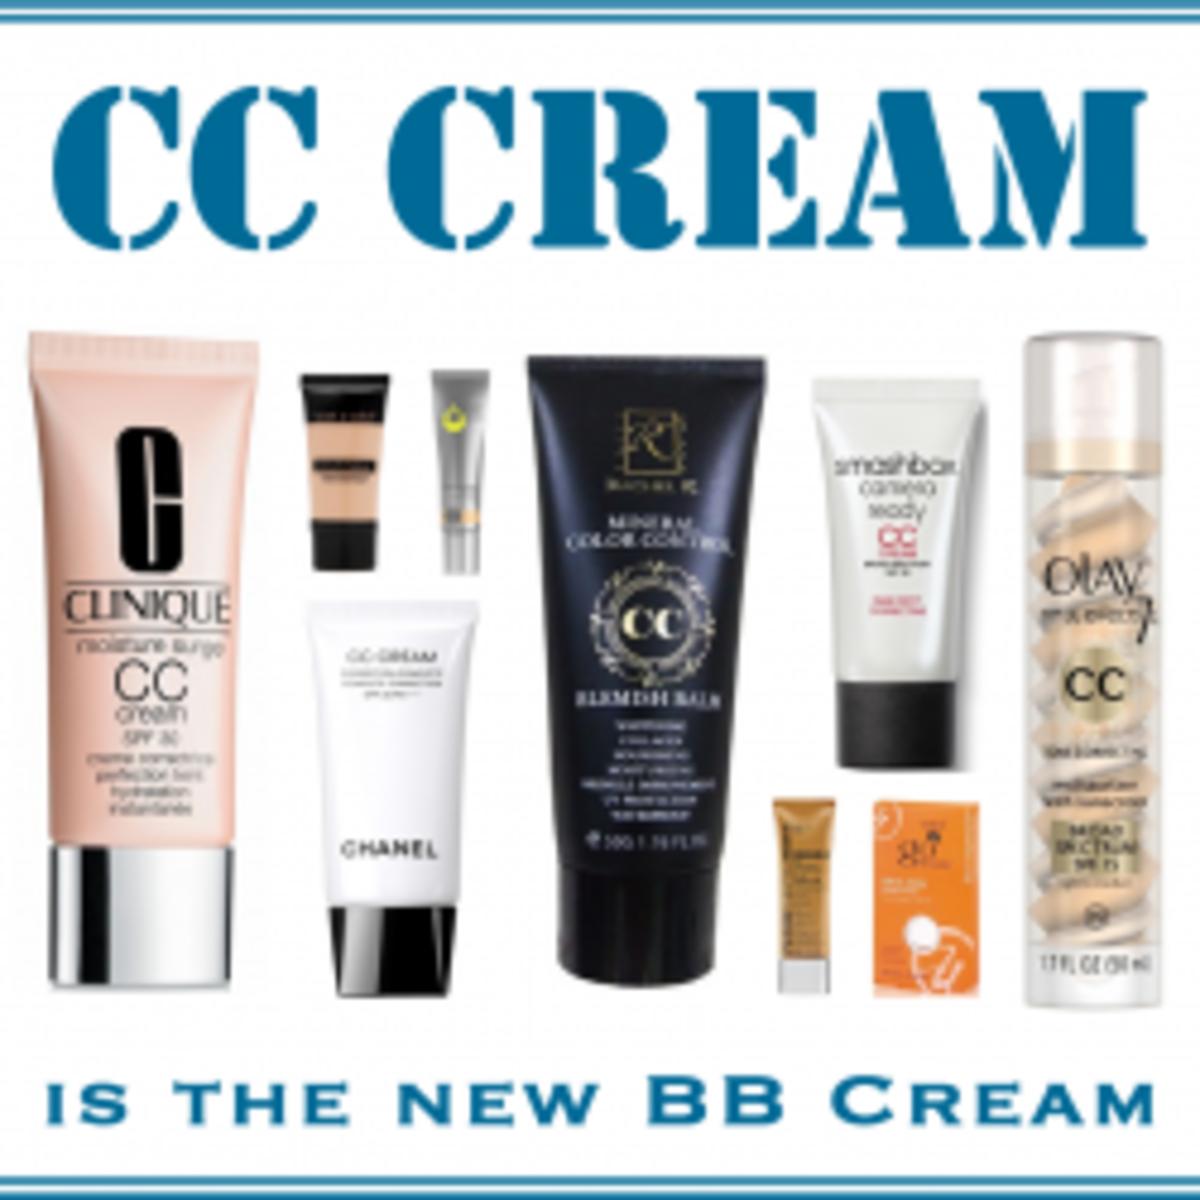 CC Cream is the New BB Cream